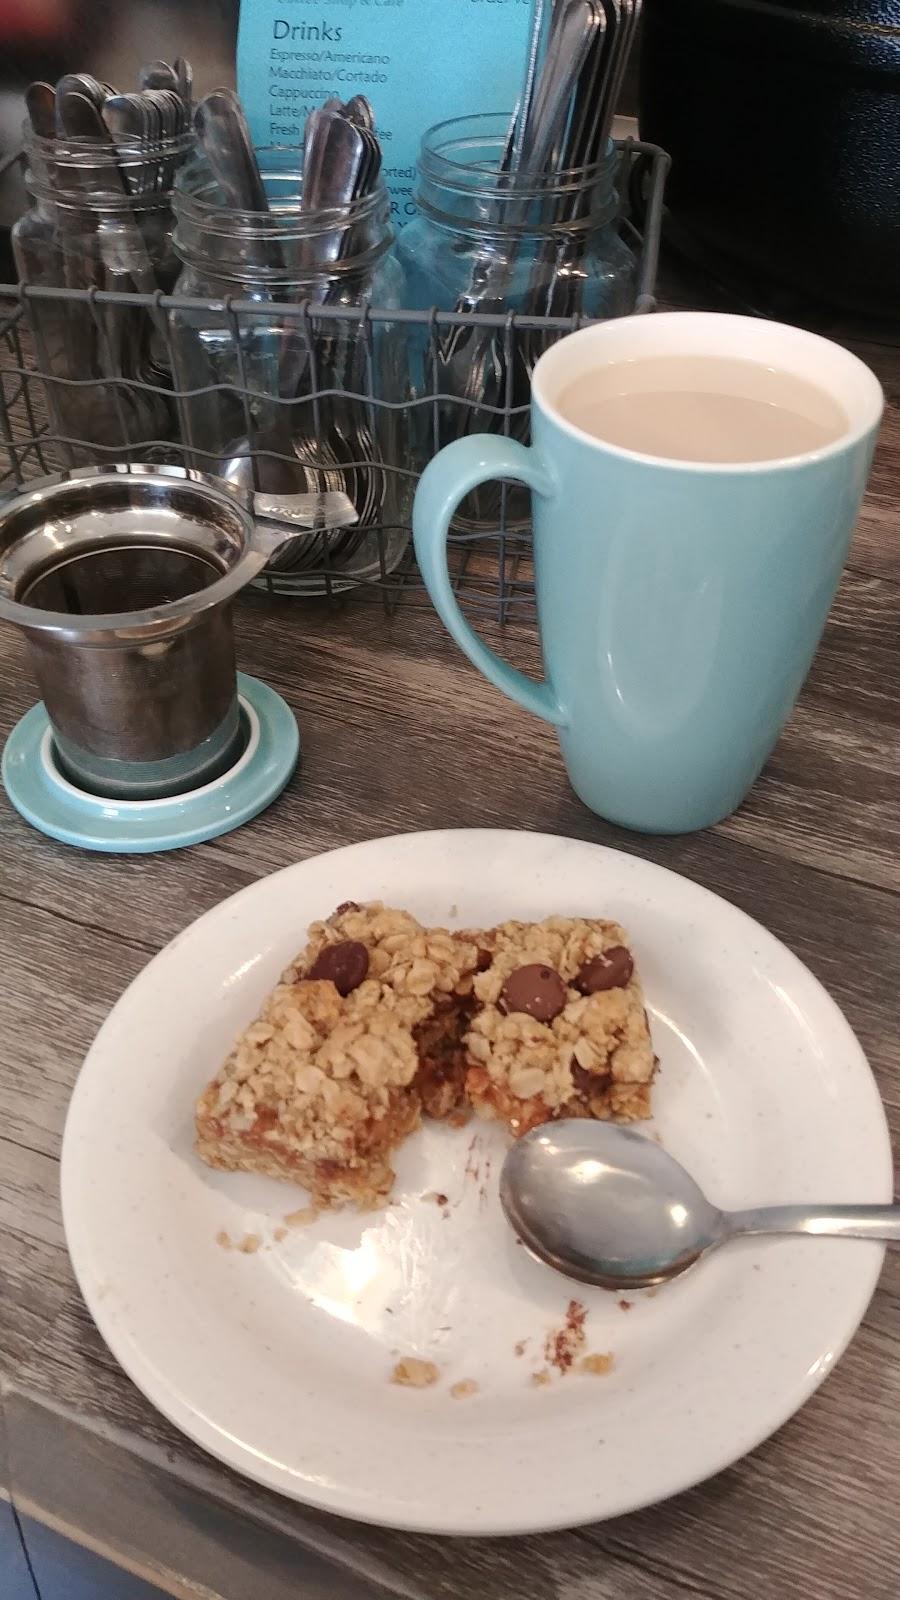 The Last Drop Coffee Shop & Cafe - cafe  | Photo 7 of 10 | Address: 105 S Santa Fe Ave, Fountain, CO 80817, USA | Phone: (719) 209-3240